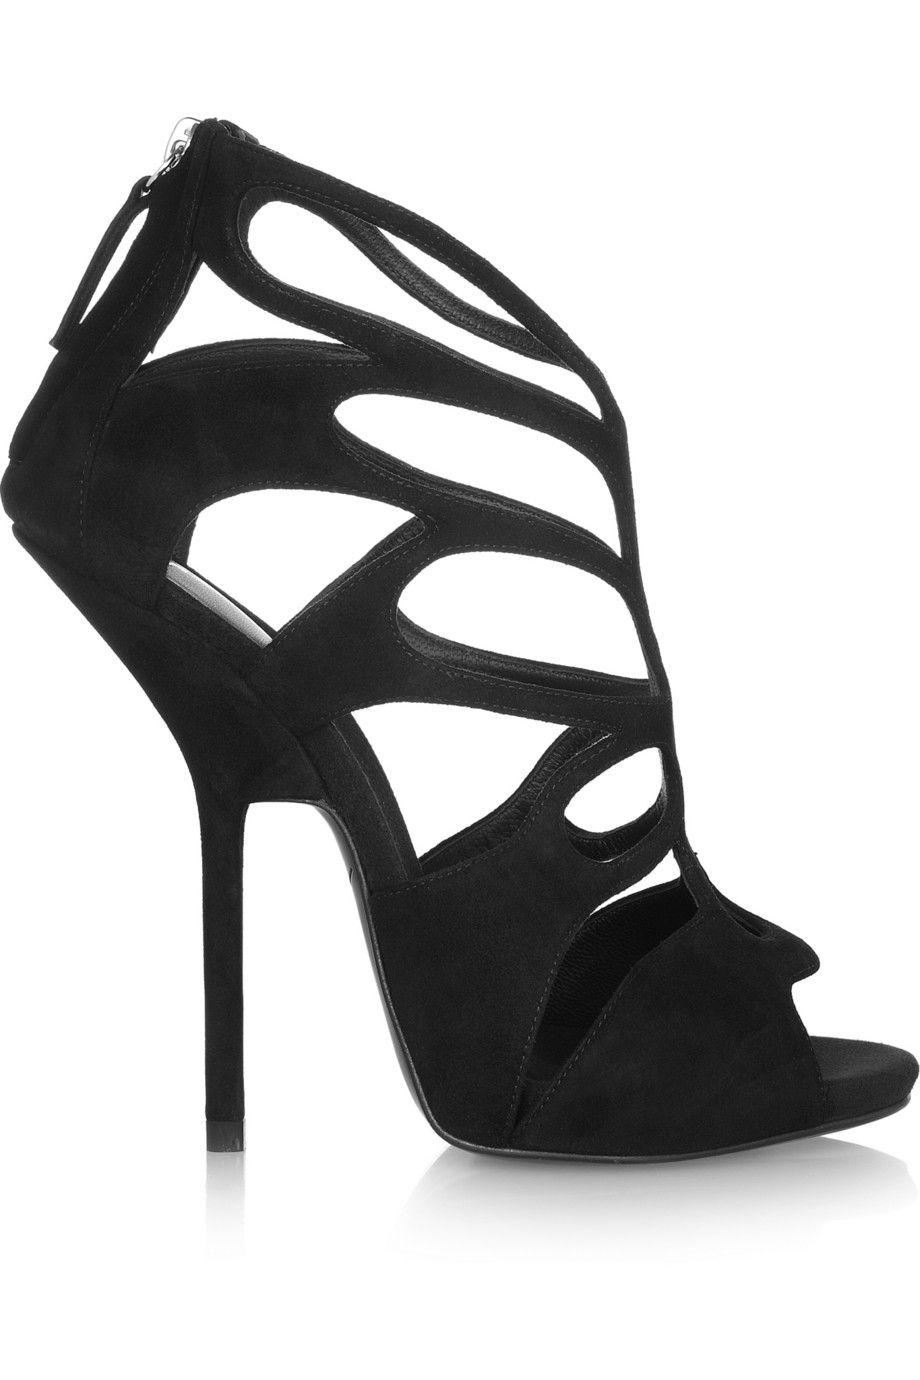 DROPKICKS STOCK ITEM: New stylish women sandals 2016 elegant open toe thin  high heels sandals black high-quality shoes woman Plus size can customized